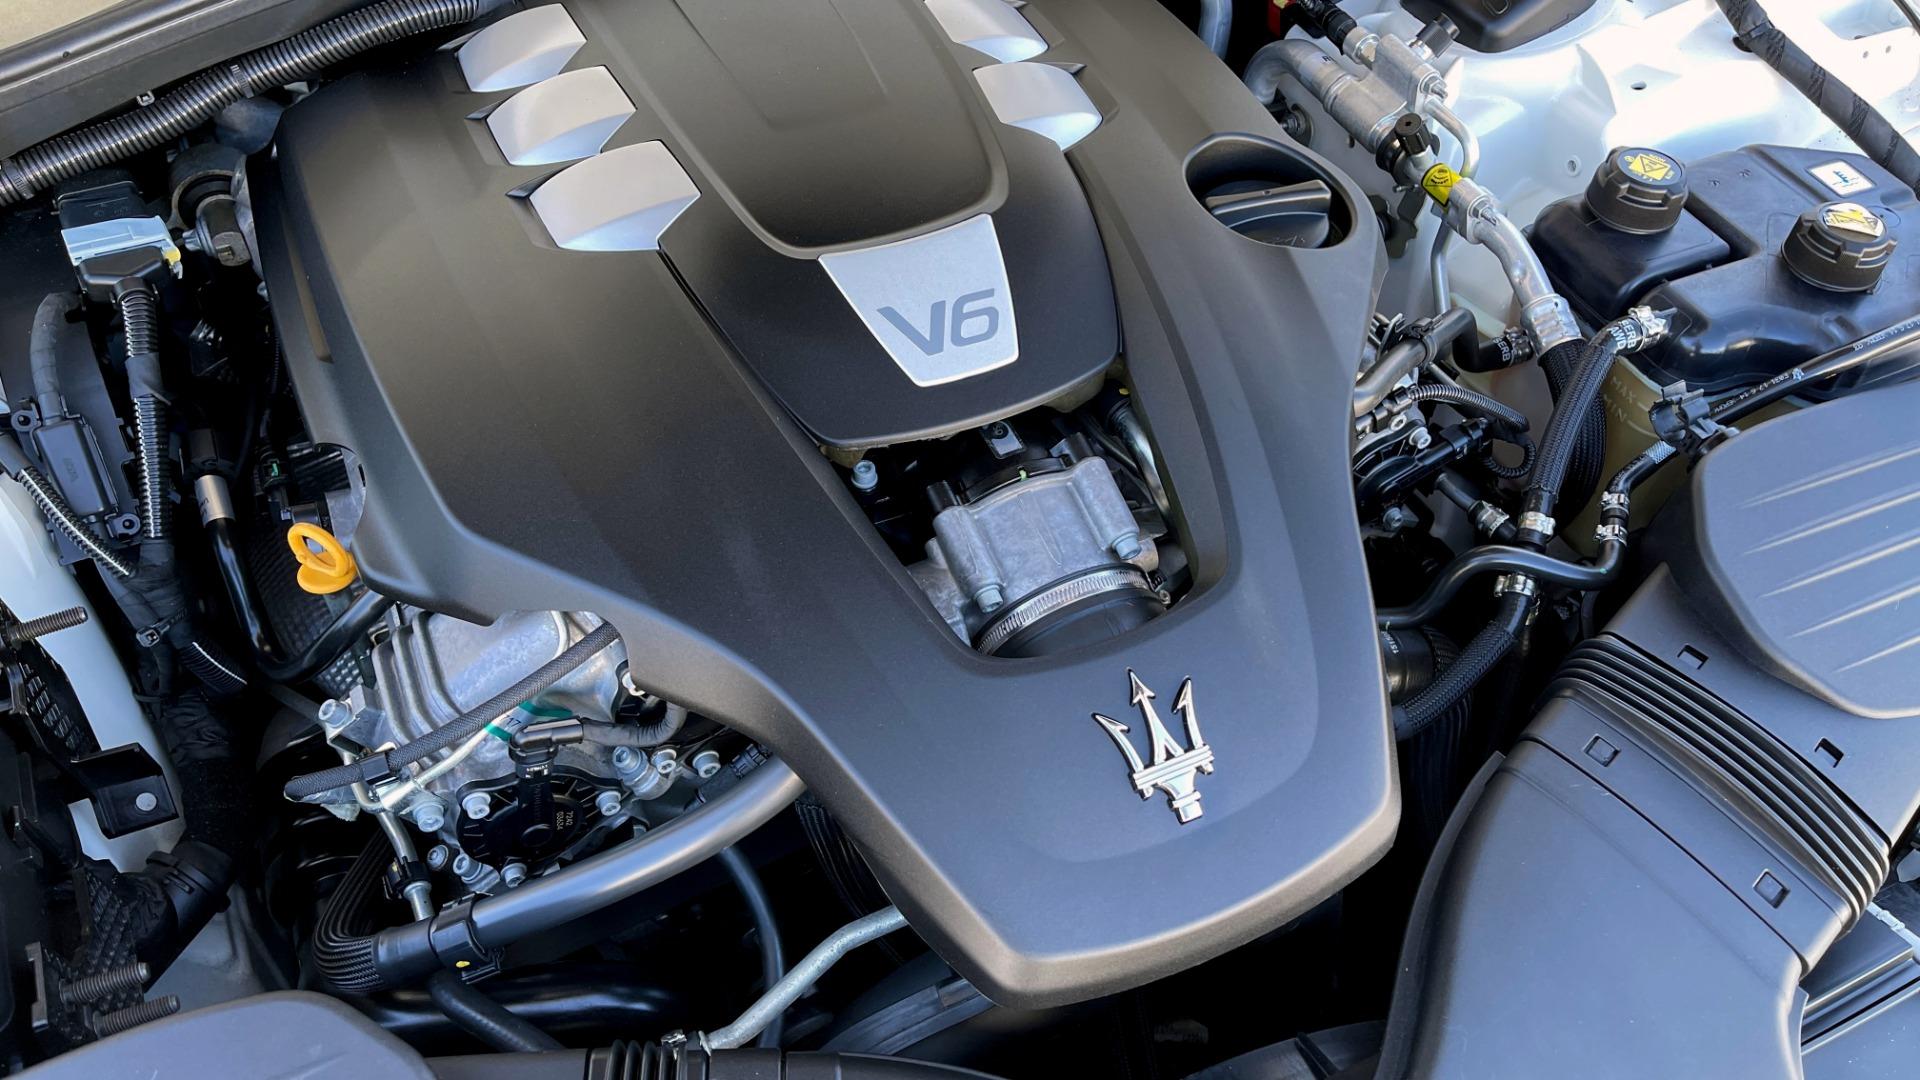 Used 2018 Maserati GHIBLI SEDAN / RWD / 3.0L V6 / SUNROOF / NAV / REARVIEW for sale $42,995 at Formula Imports in Charlotte NC 28227 13